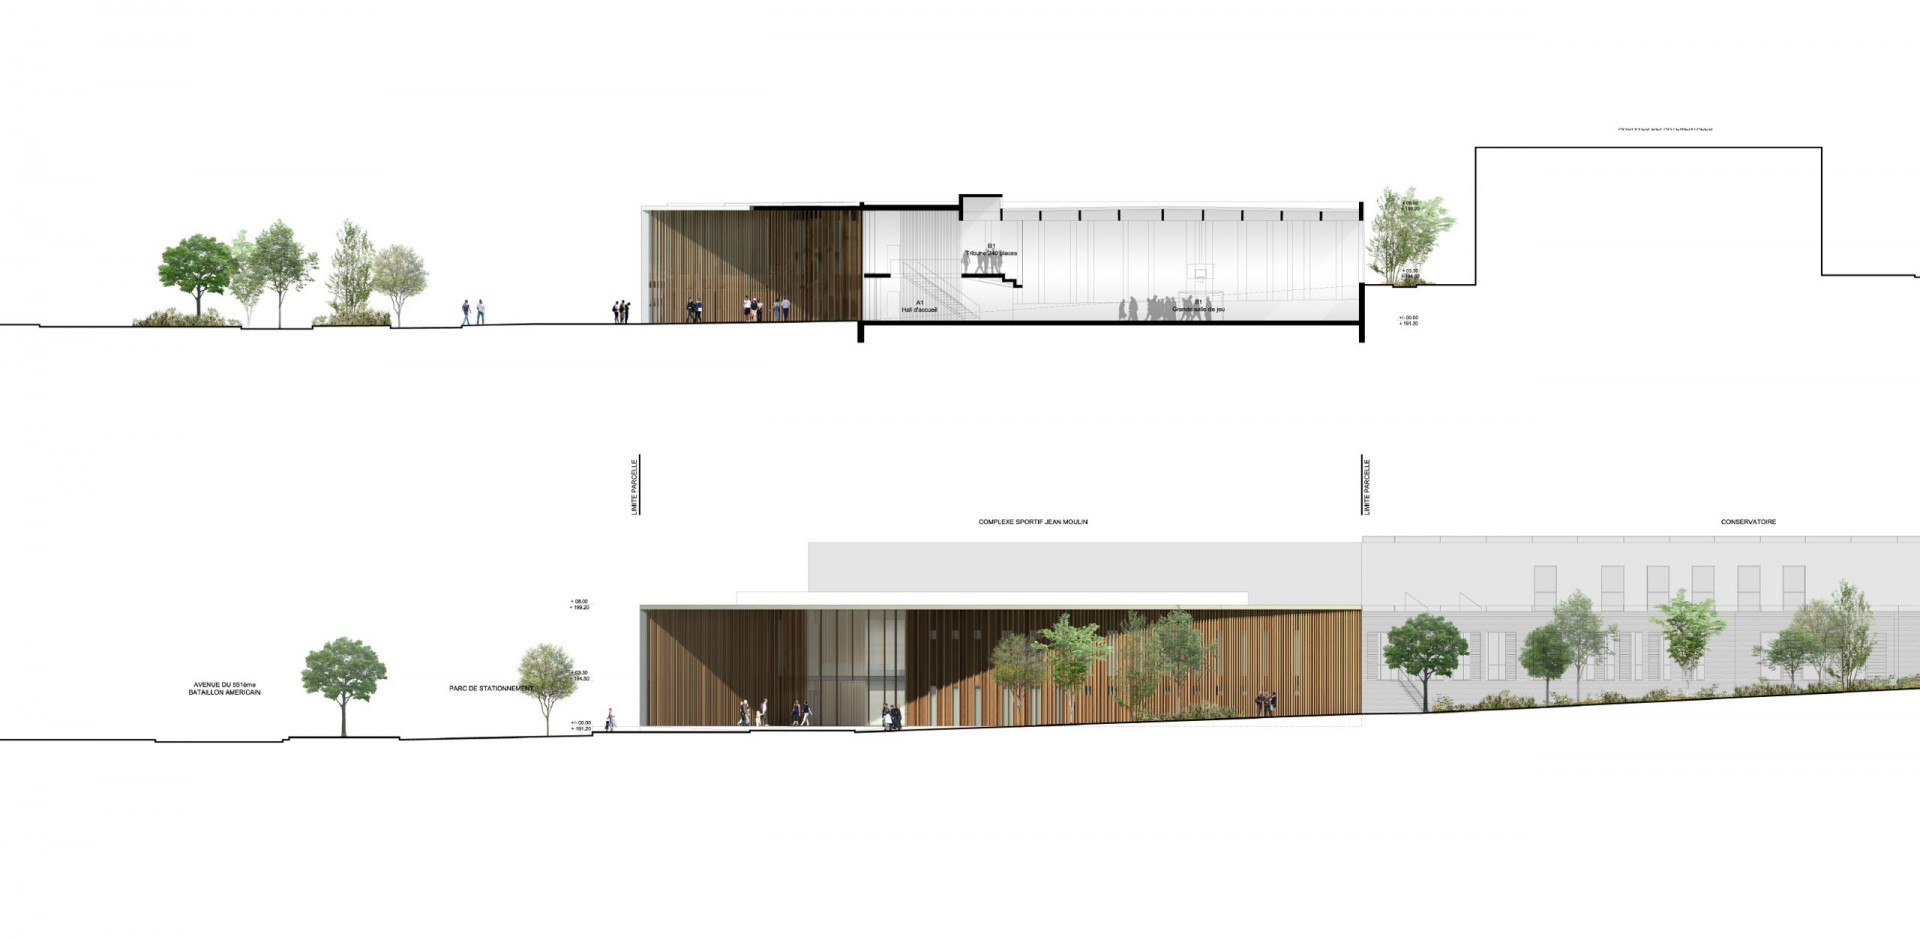 adrien champsaur architecture architecte marseille. Black Bedroom Furniture Sets. Home Design Ideas